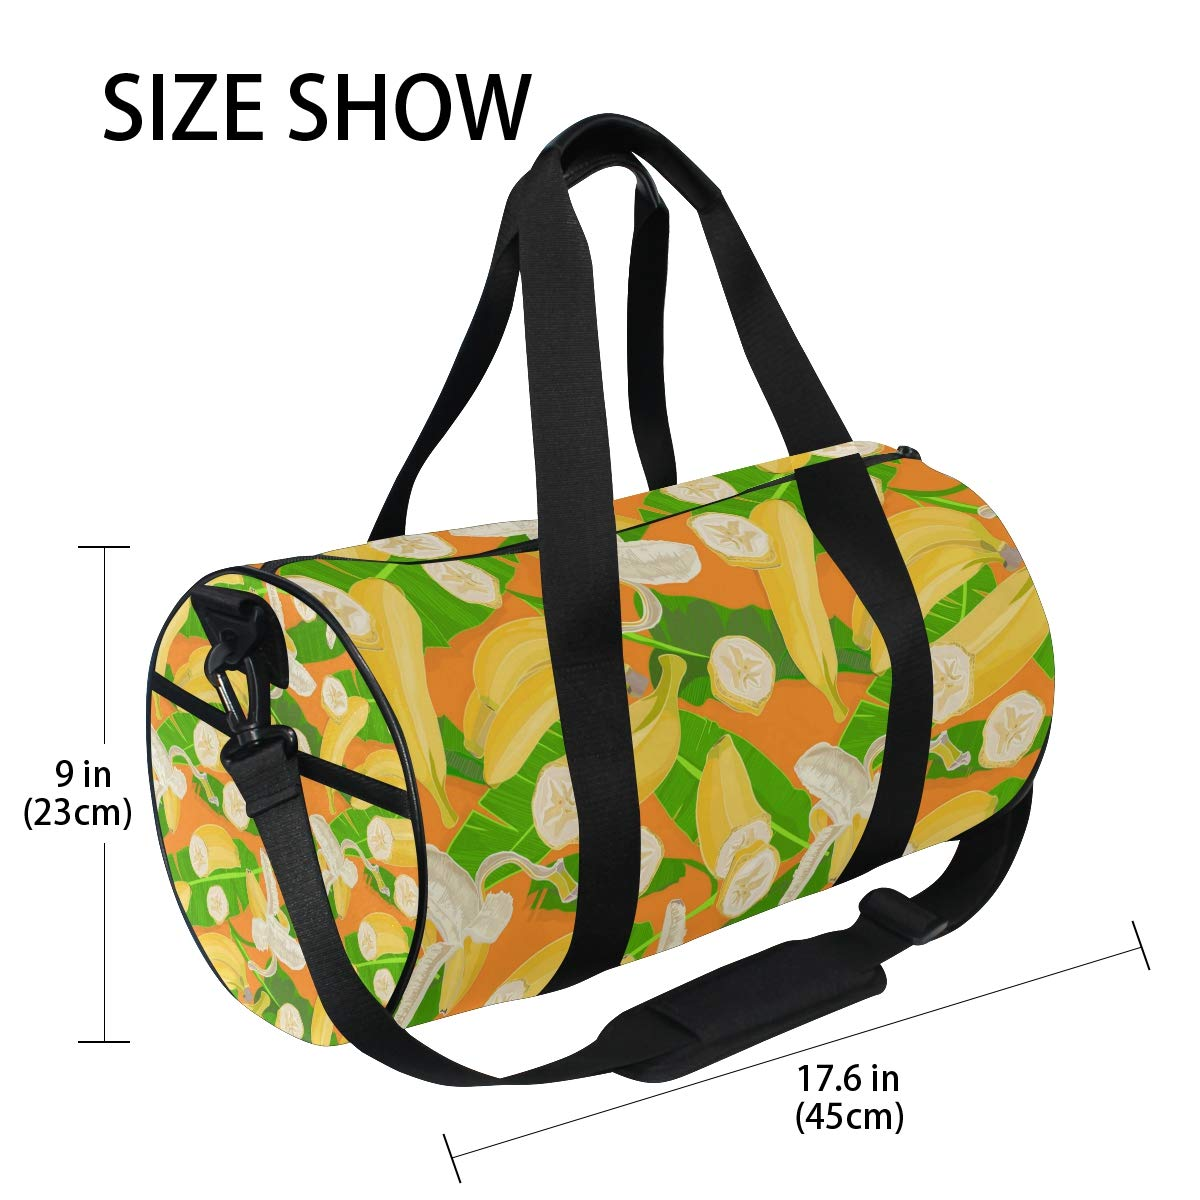 Waterproof Non-Slip Wearable Crossbody Bag fitness bag Shoulder Bag Terro Fruit Picture